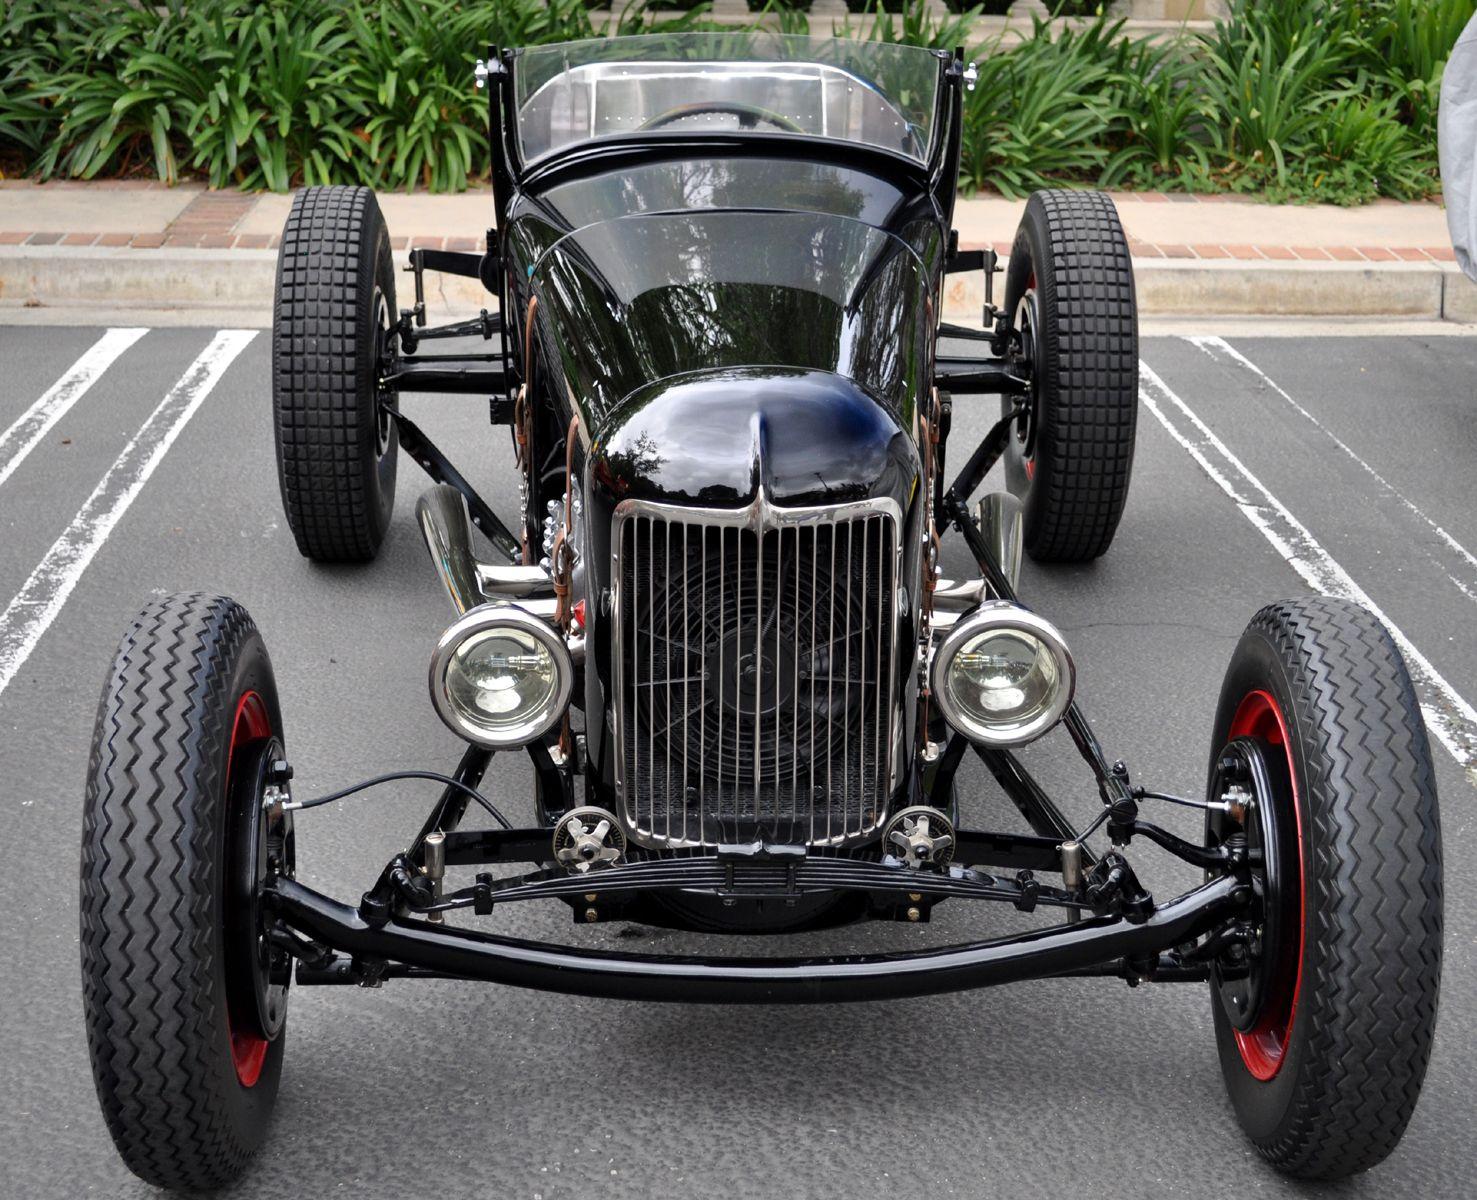 austin 7 hot rod - Google Search | car | Pinterest | Cars, Custom ...